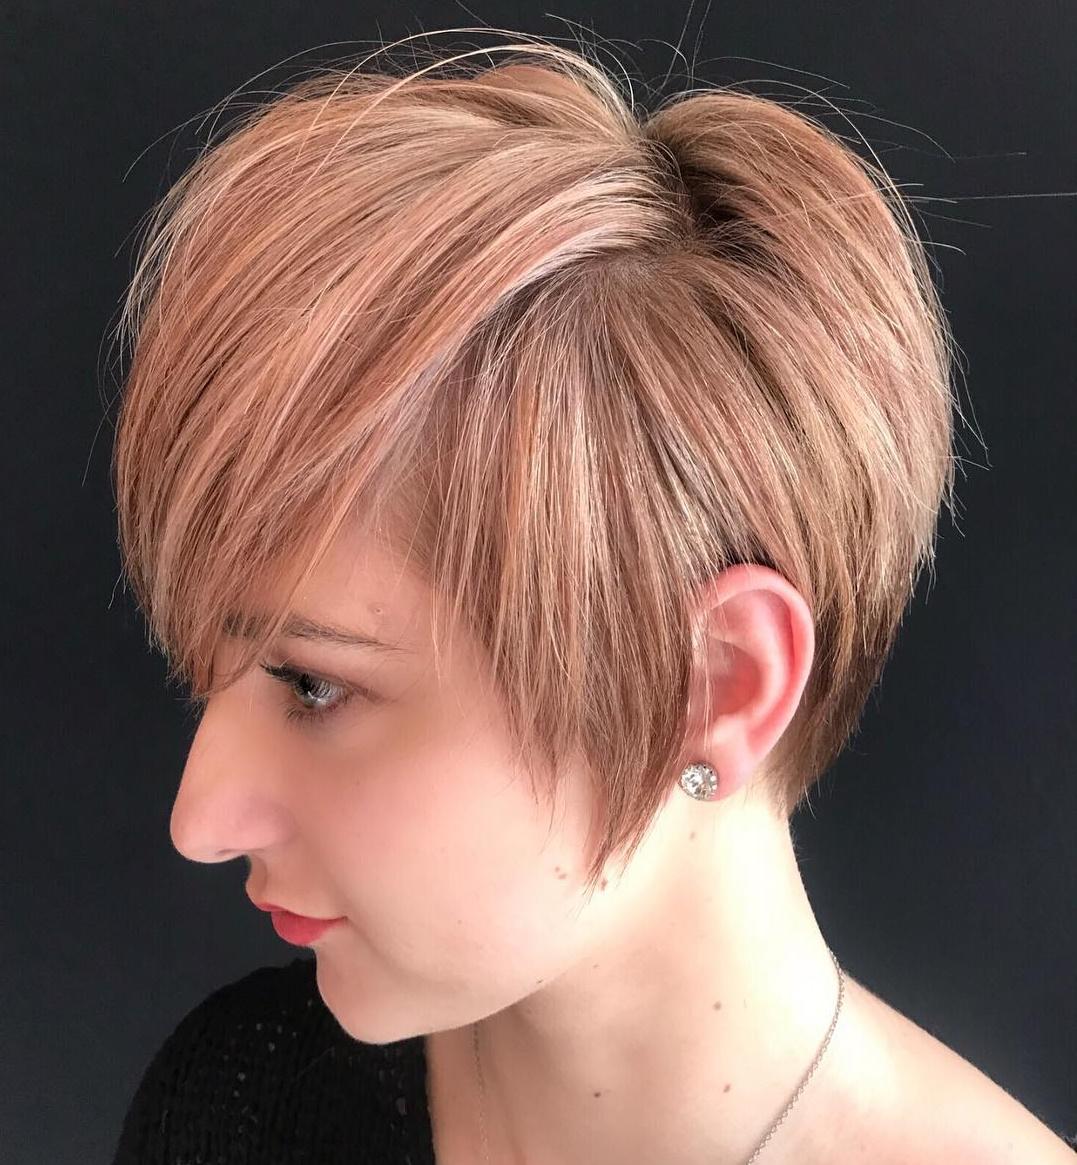 Short Length Thick Haircut with Long Sideburns and Bangs